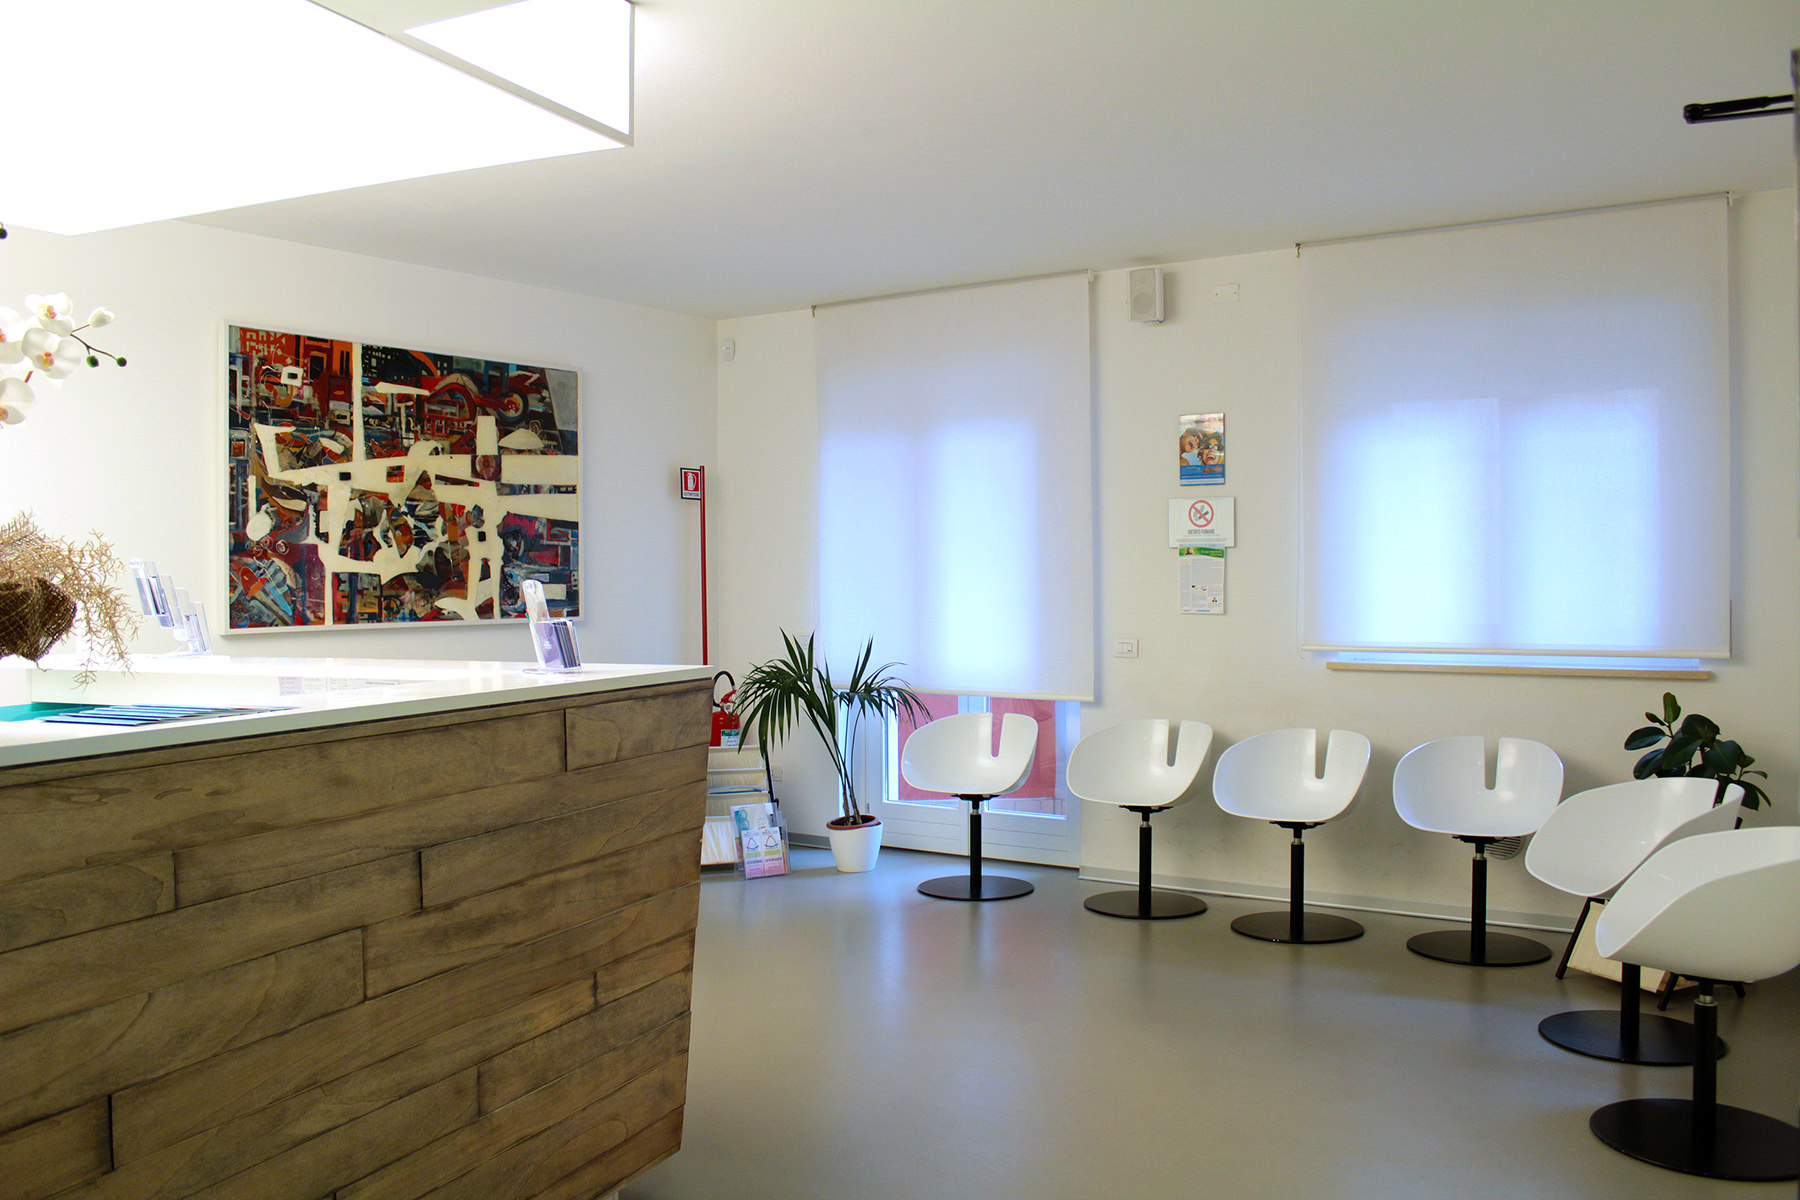 La Sala D Attesa.Foto Sala D Attesa Studio Dentistico San Valentino Bussolengo Vr